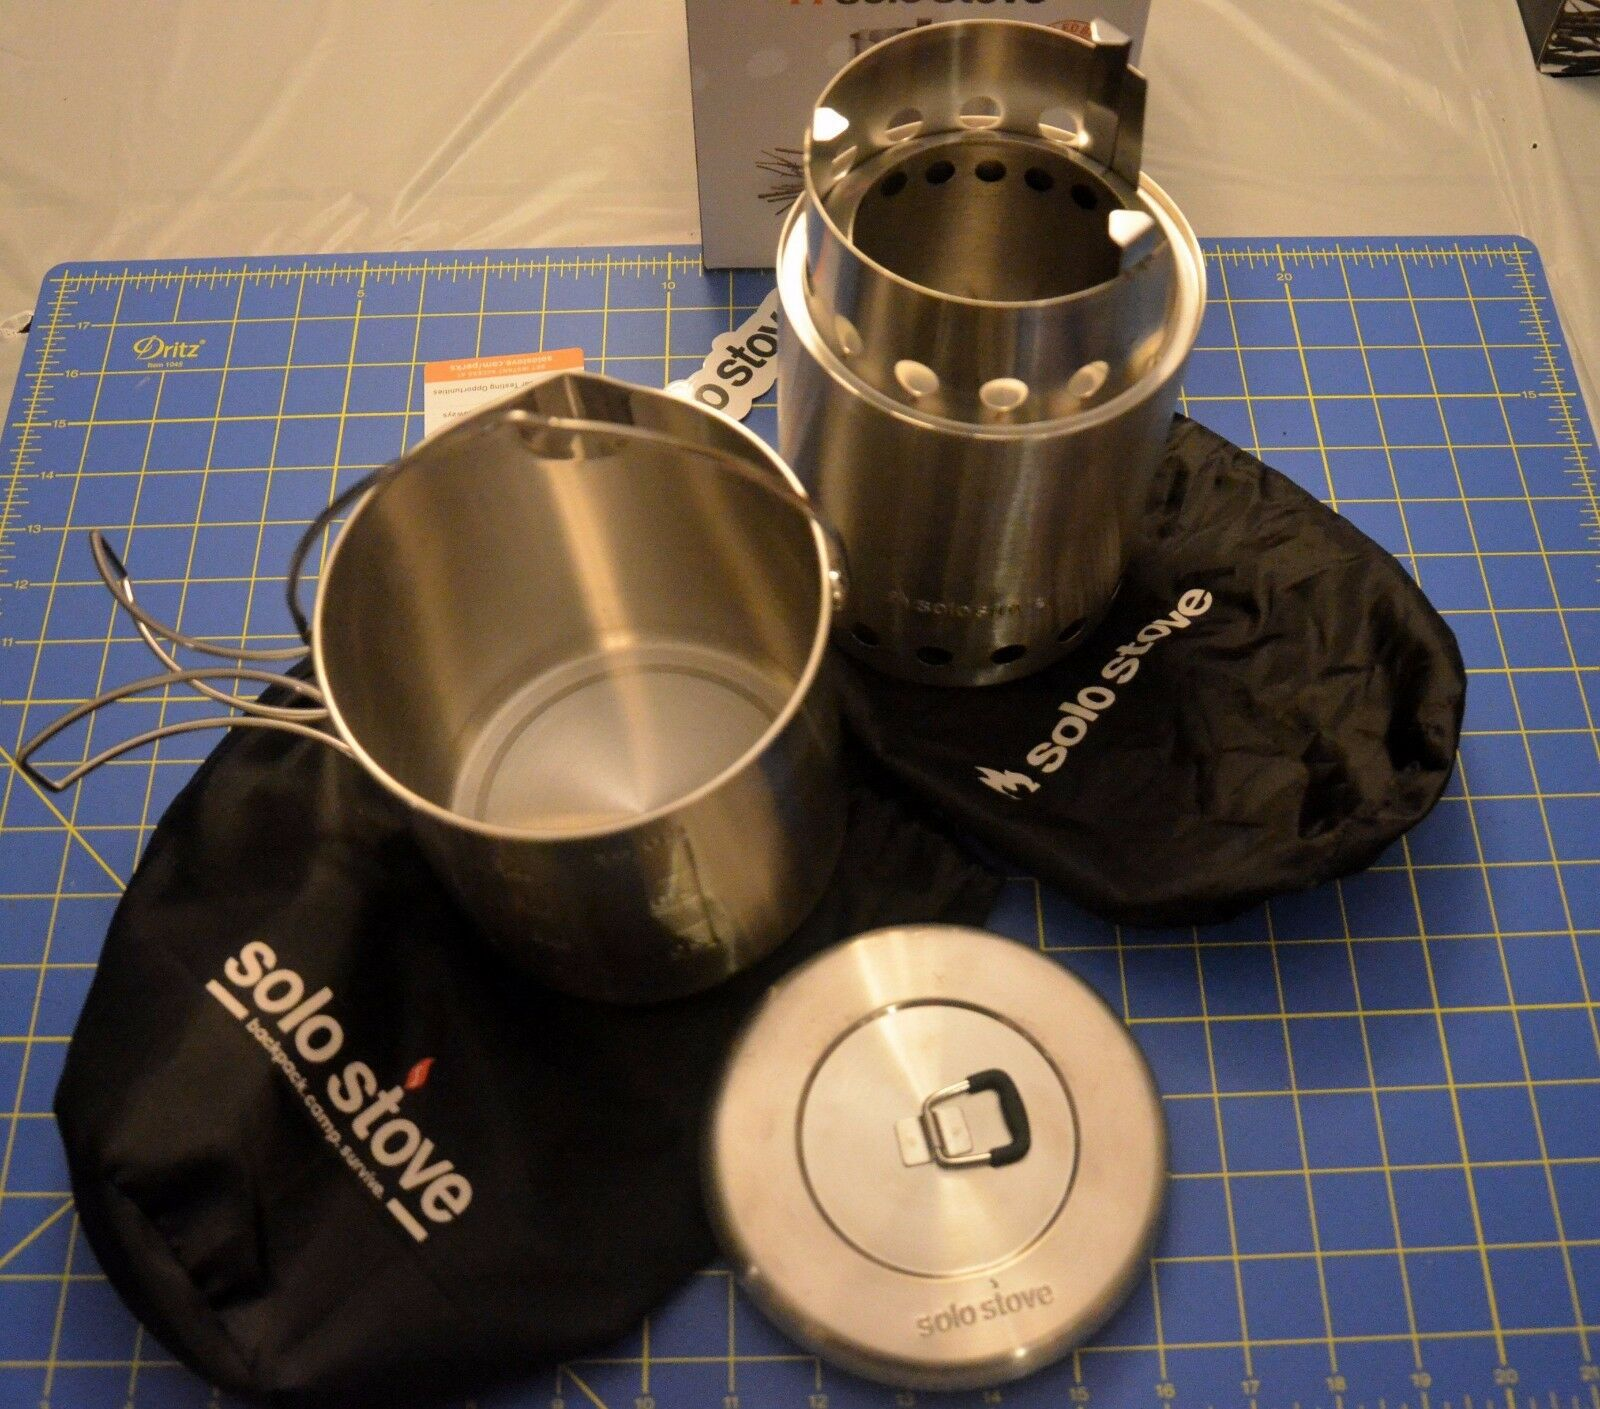 TITAN by Solo Stove Combo Kit twig burning gasifier Large Stove & Pot 1800 Set ☦